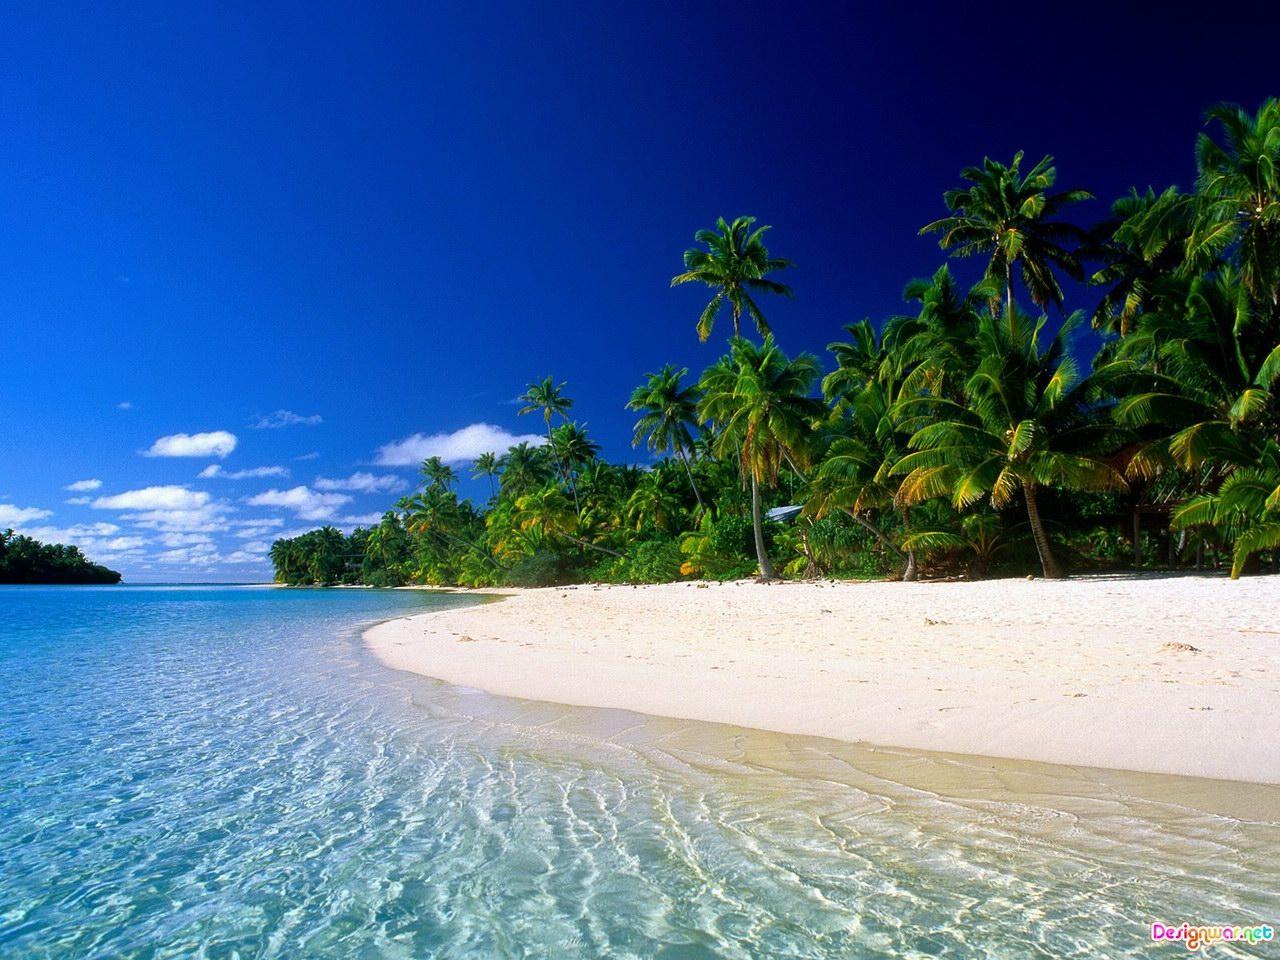 Tropical Beach desktop Wallpaperjpg 1280x960